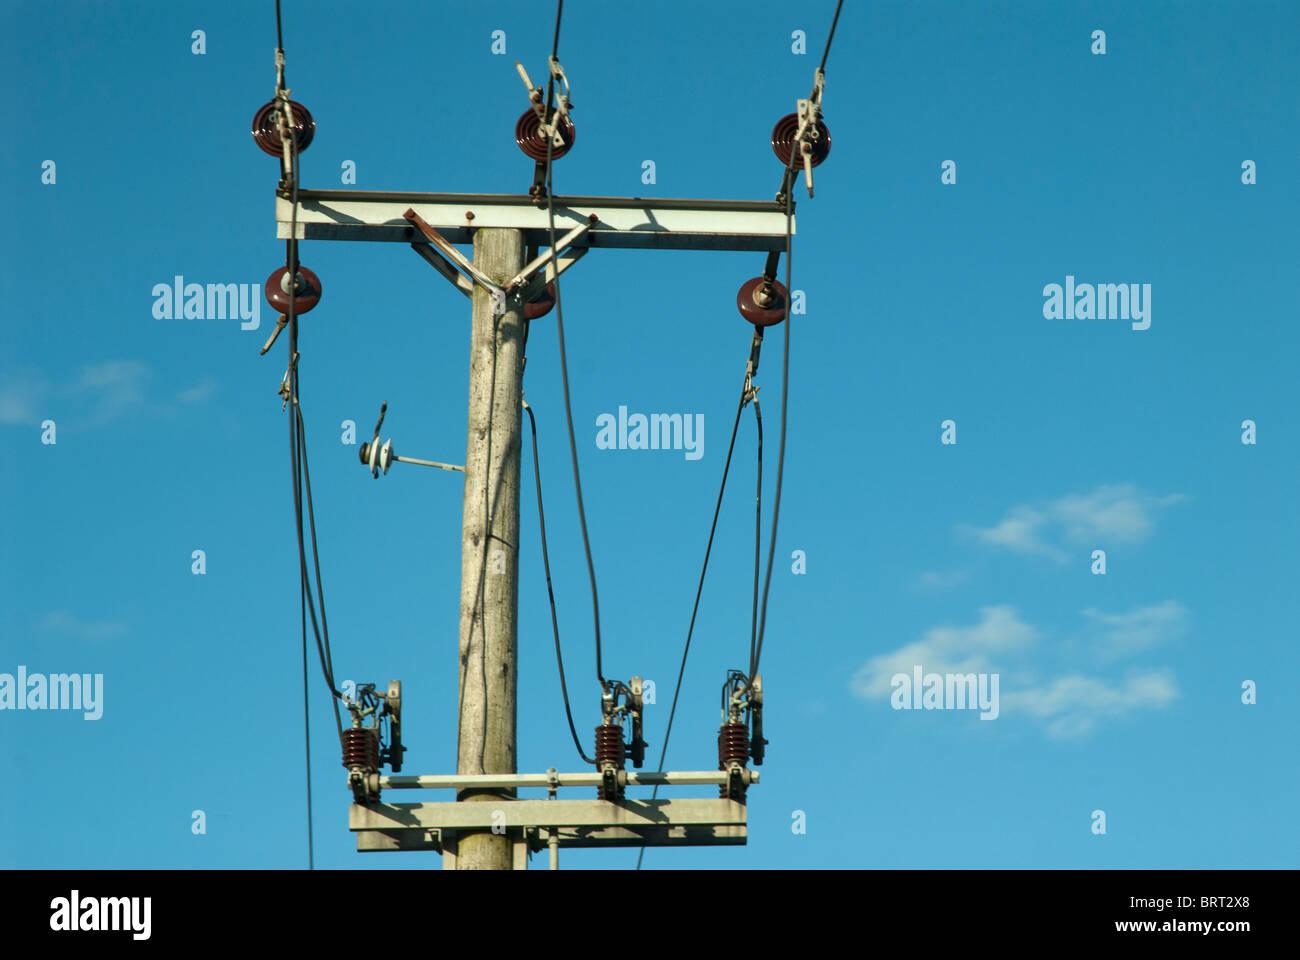 Wooden Electricity Pylon - Stock Image